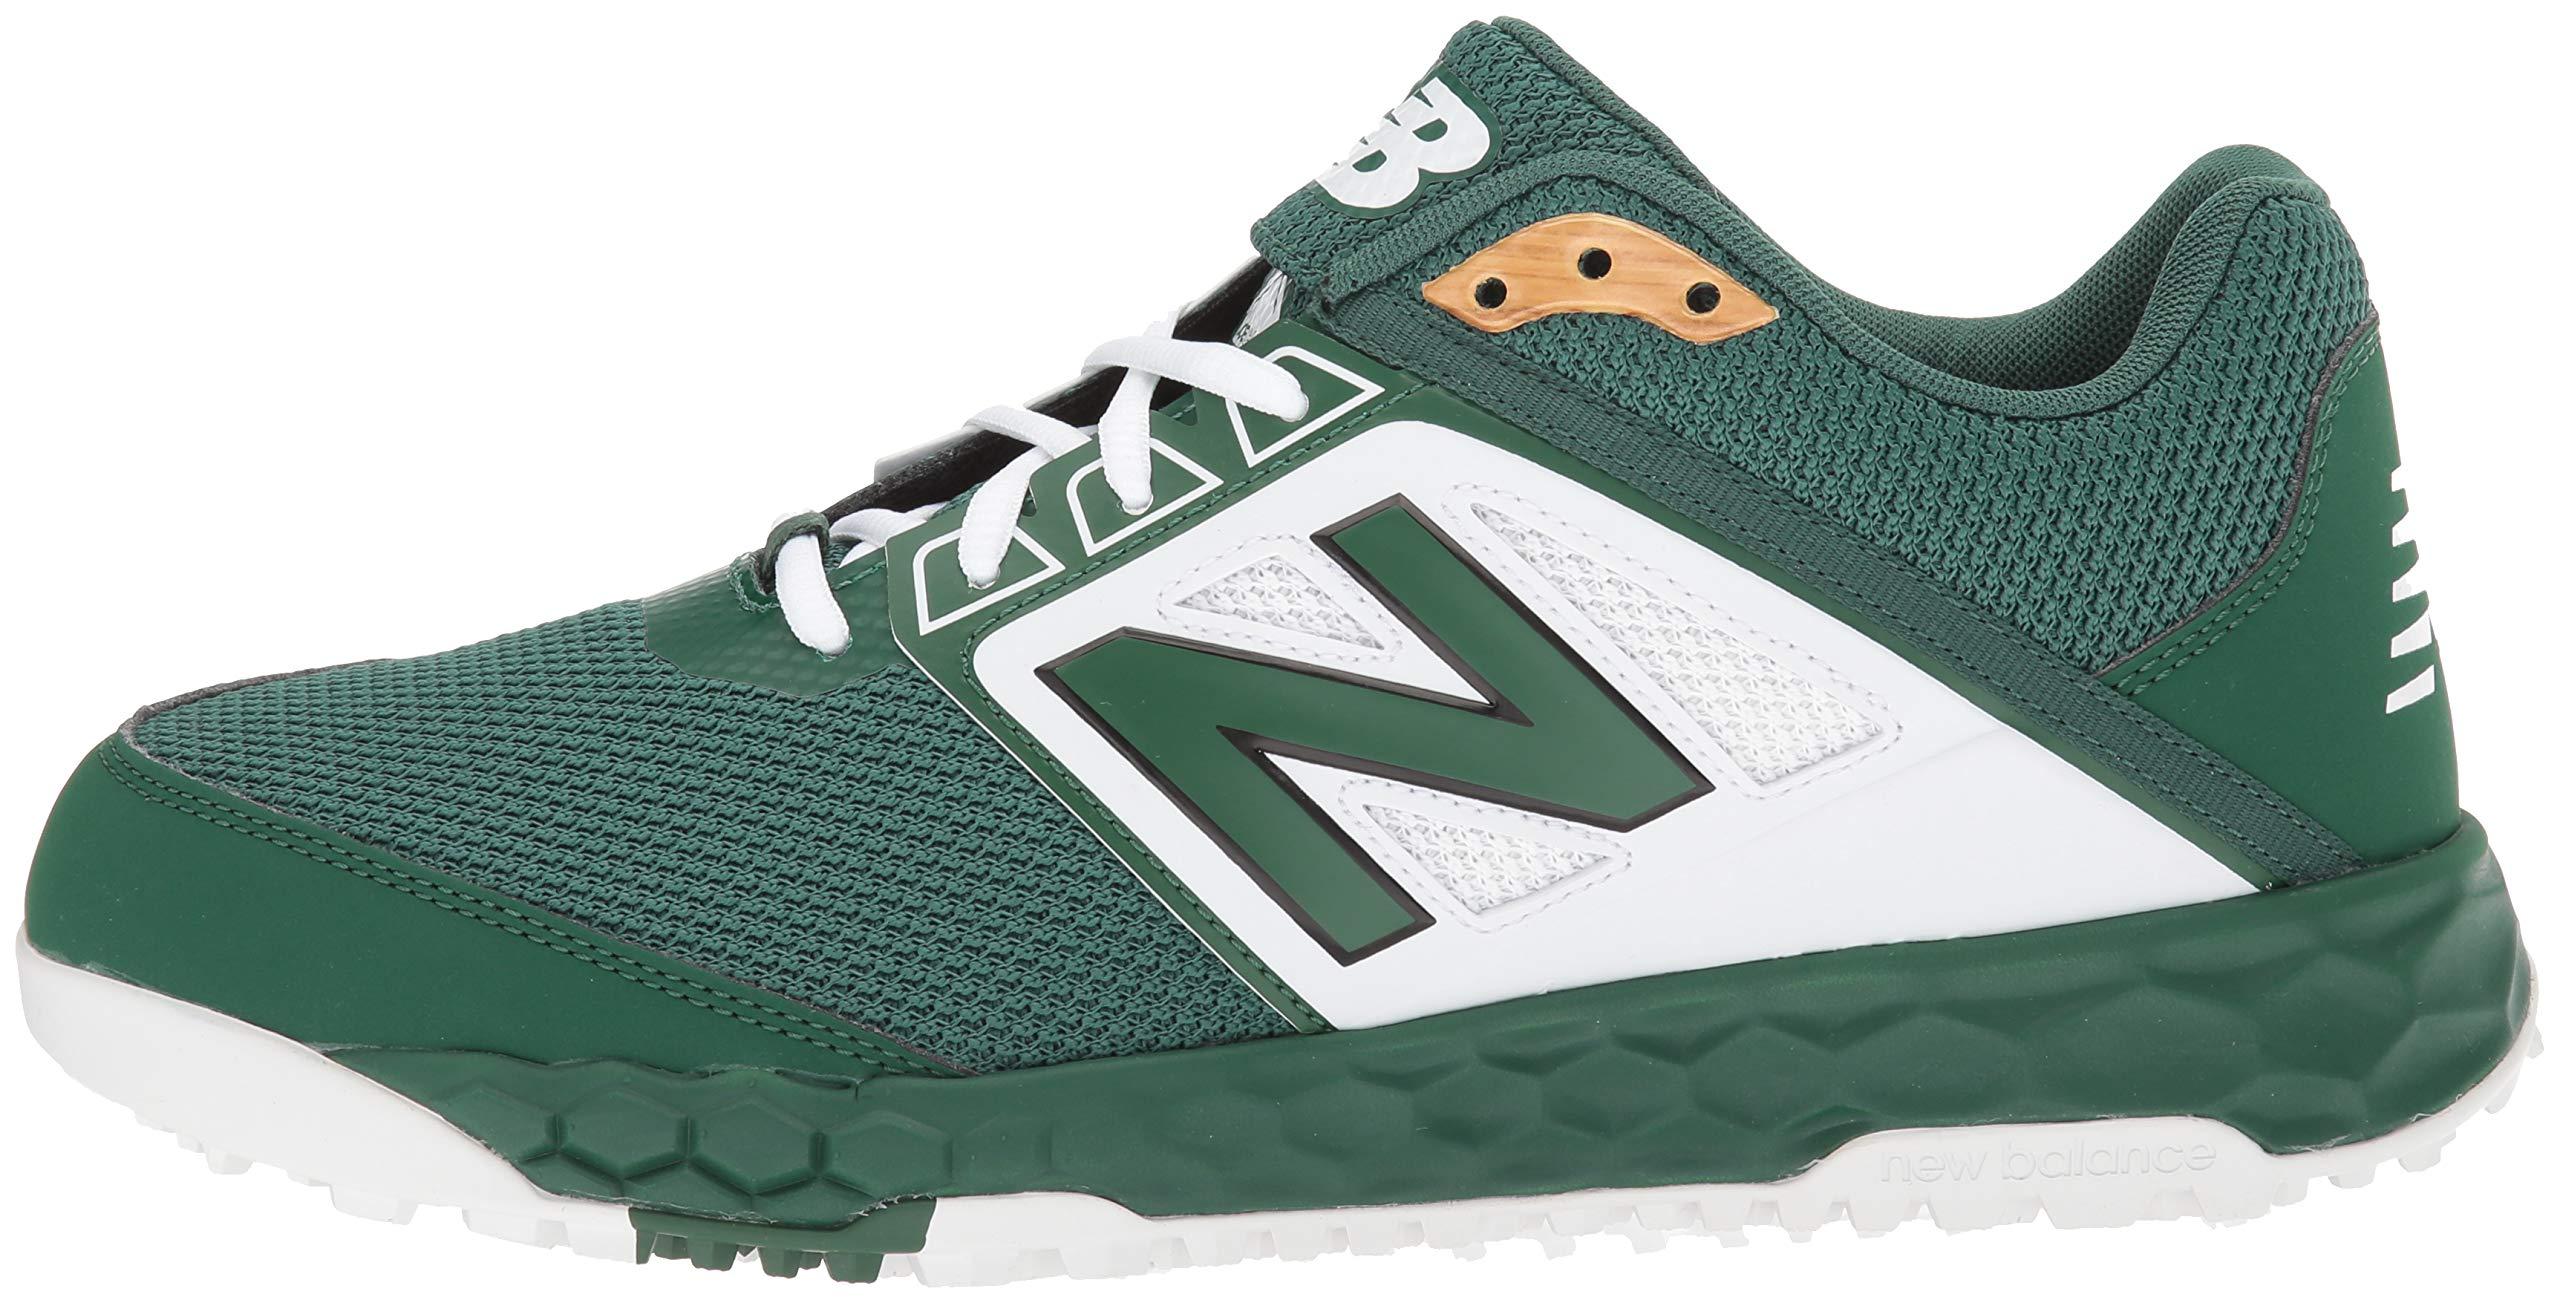 New Balance Men's 3000v4 Turf Baseball Shoe, Green/White, 5 D US by New Balance (Image #5)